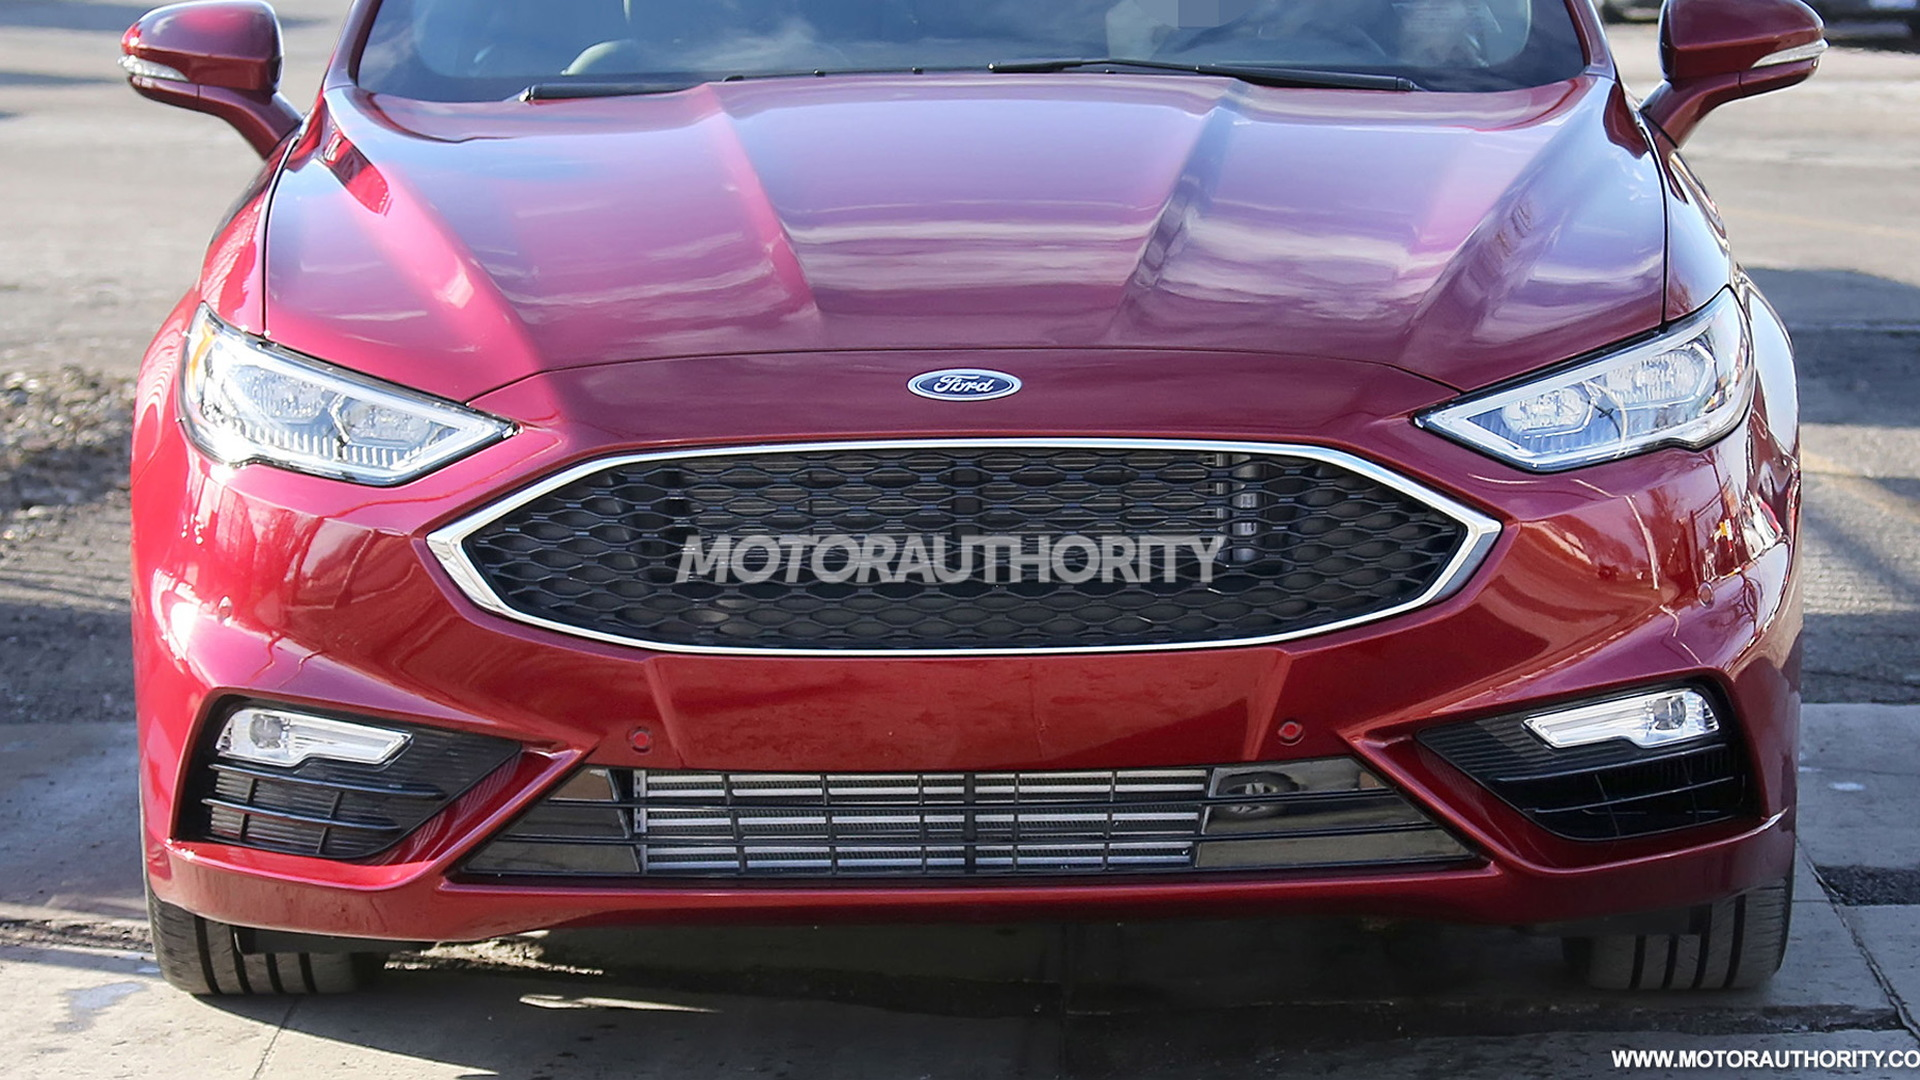 2017 Ford Fusion facelift spy shots - Image via S. Baldauf/SB-Medien